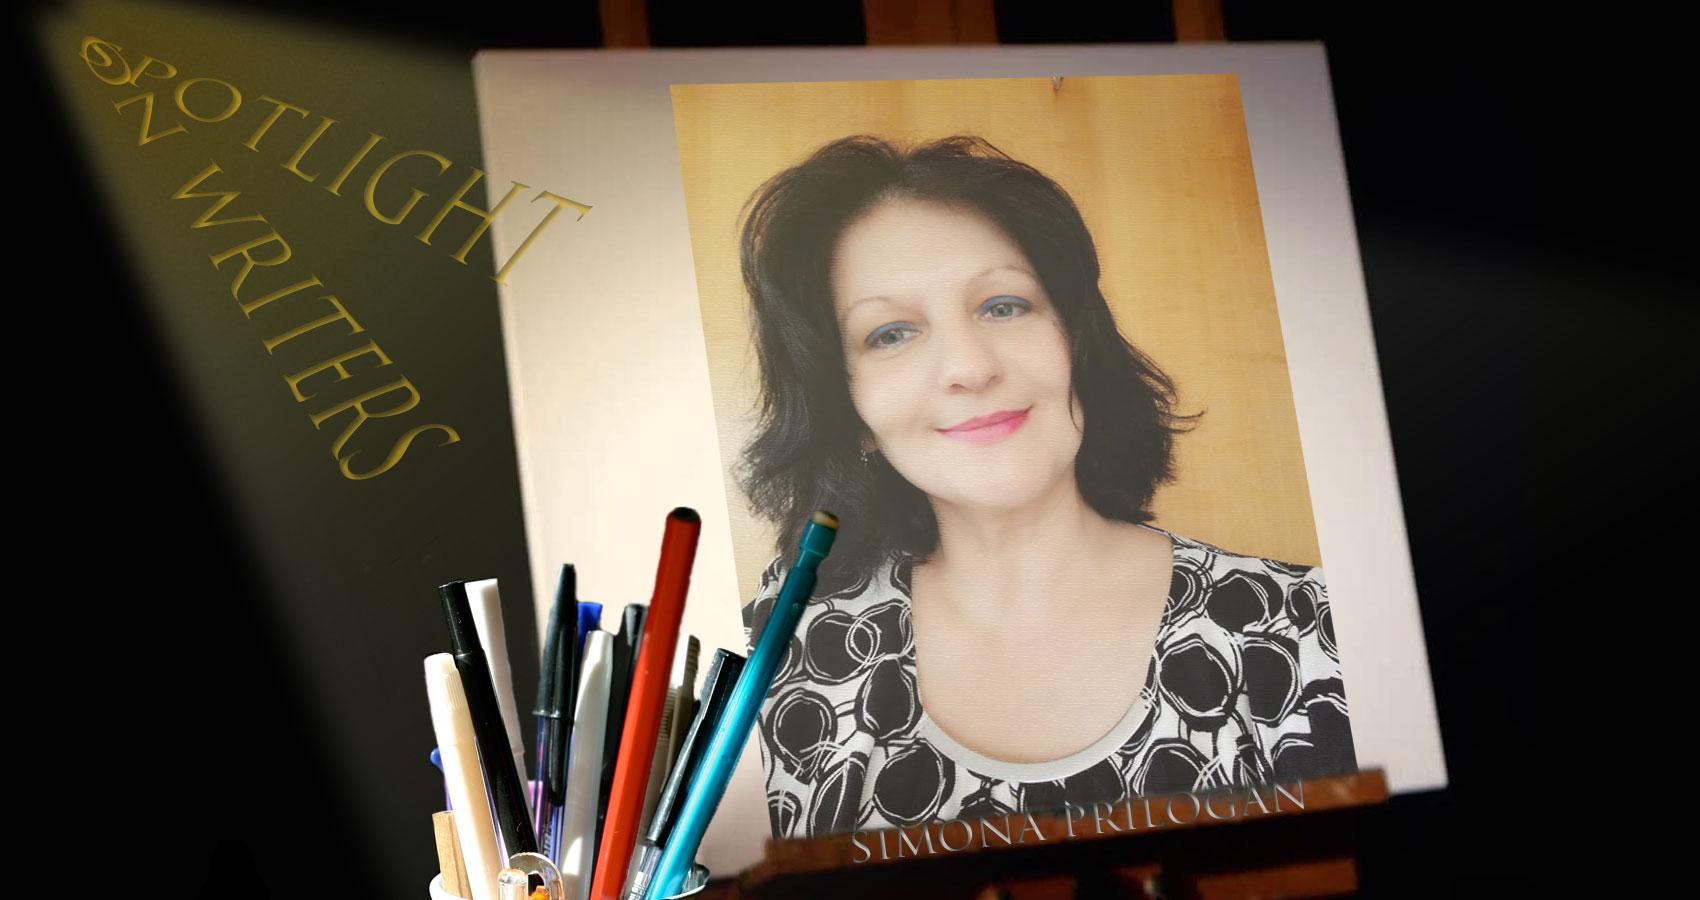 Spotlight On Writers - Simona Prilogan, interview at Spillwords.com